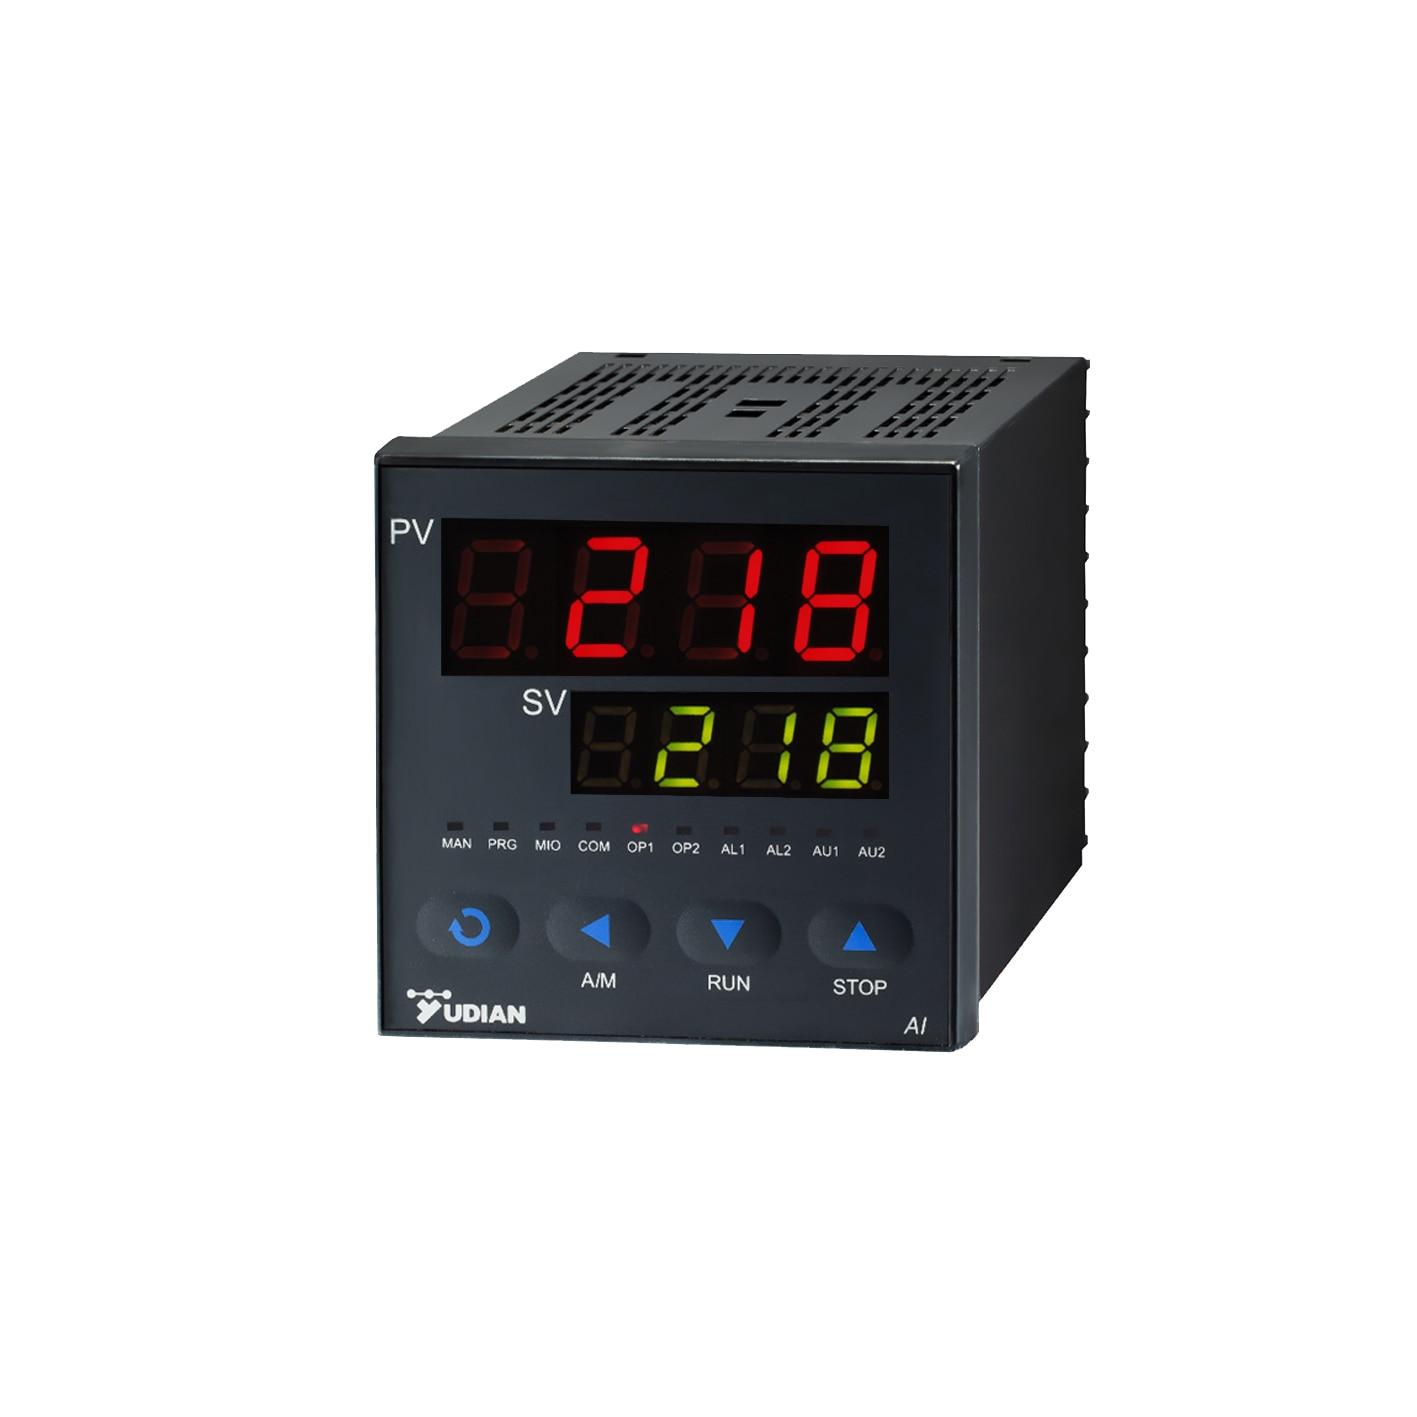 Yudian متحكم في درجة الحرارة AI-218G ذكي شاشة ديجيتال متحكم في درجة الحرارة AI-218D2G AI-218G AI-218GLO AI-218GL3